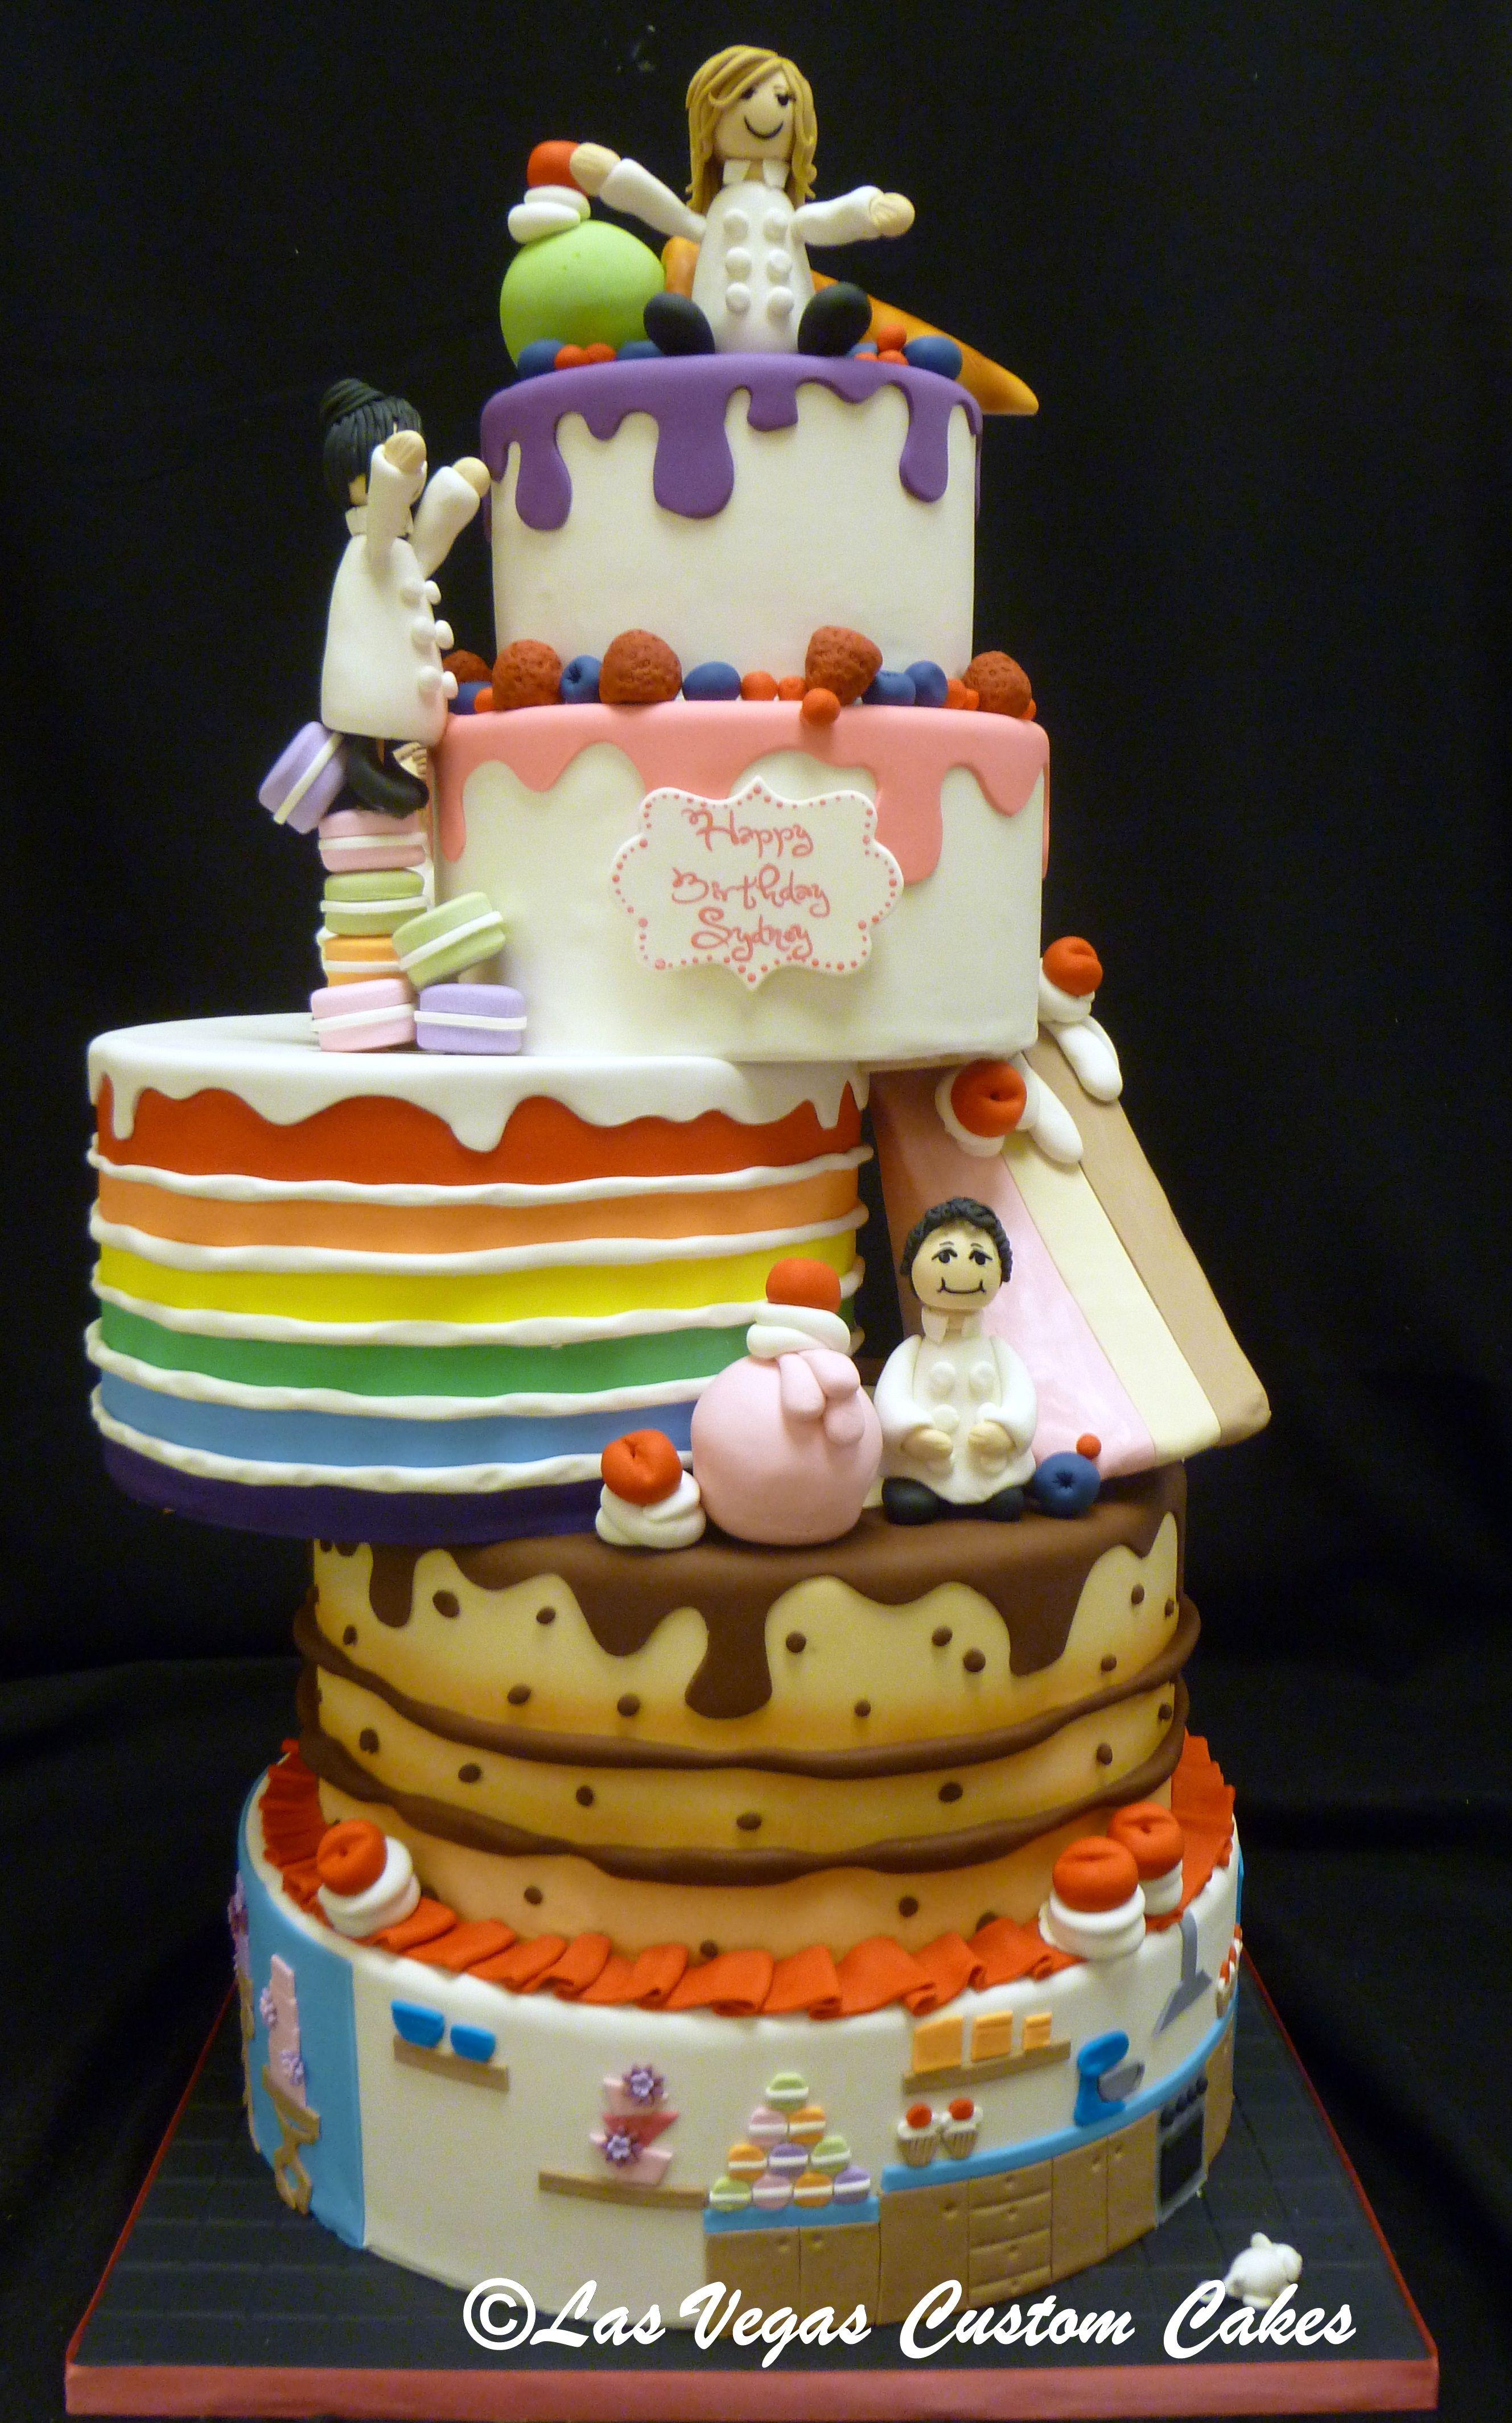 Bakers Still Making The Kids Birthday Cake From Las Vegas Custom Cakes